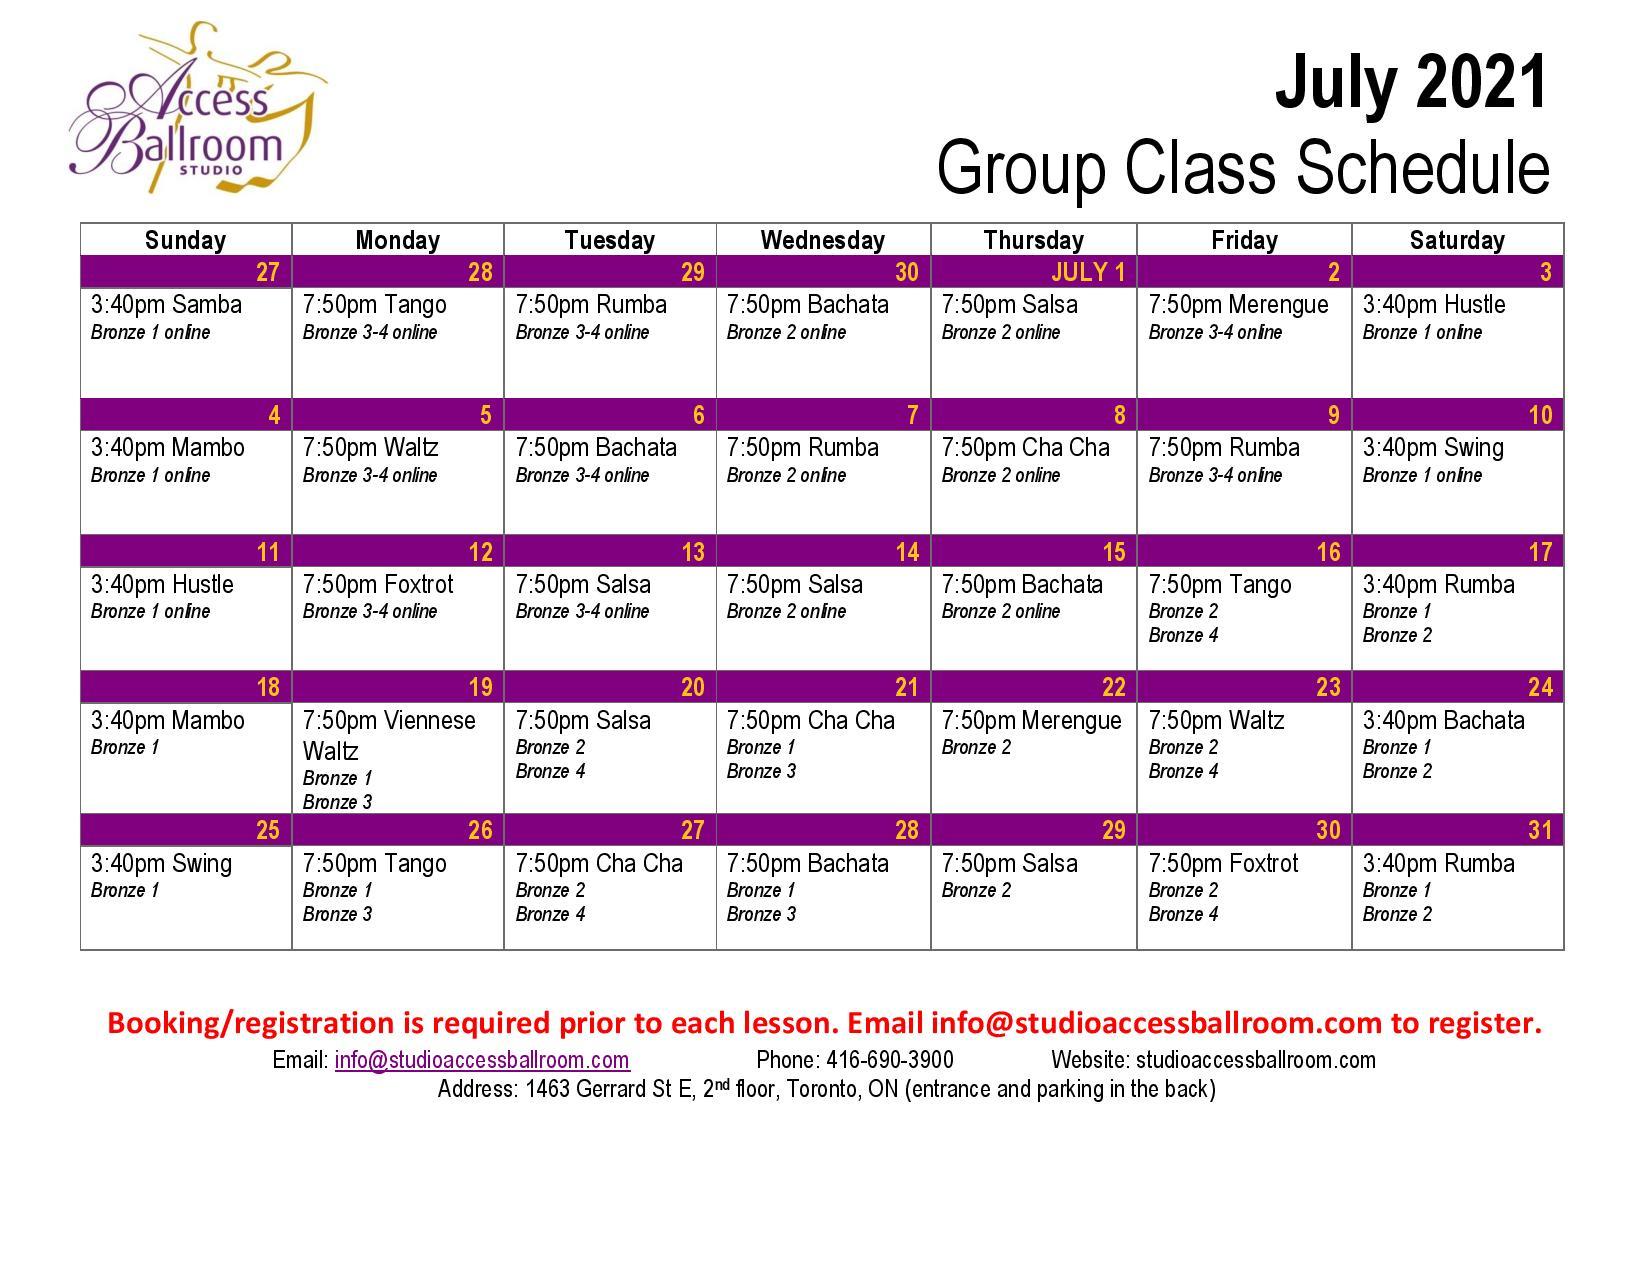 Access Ballroom July 2021 schedule